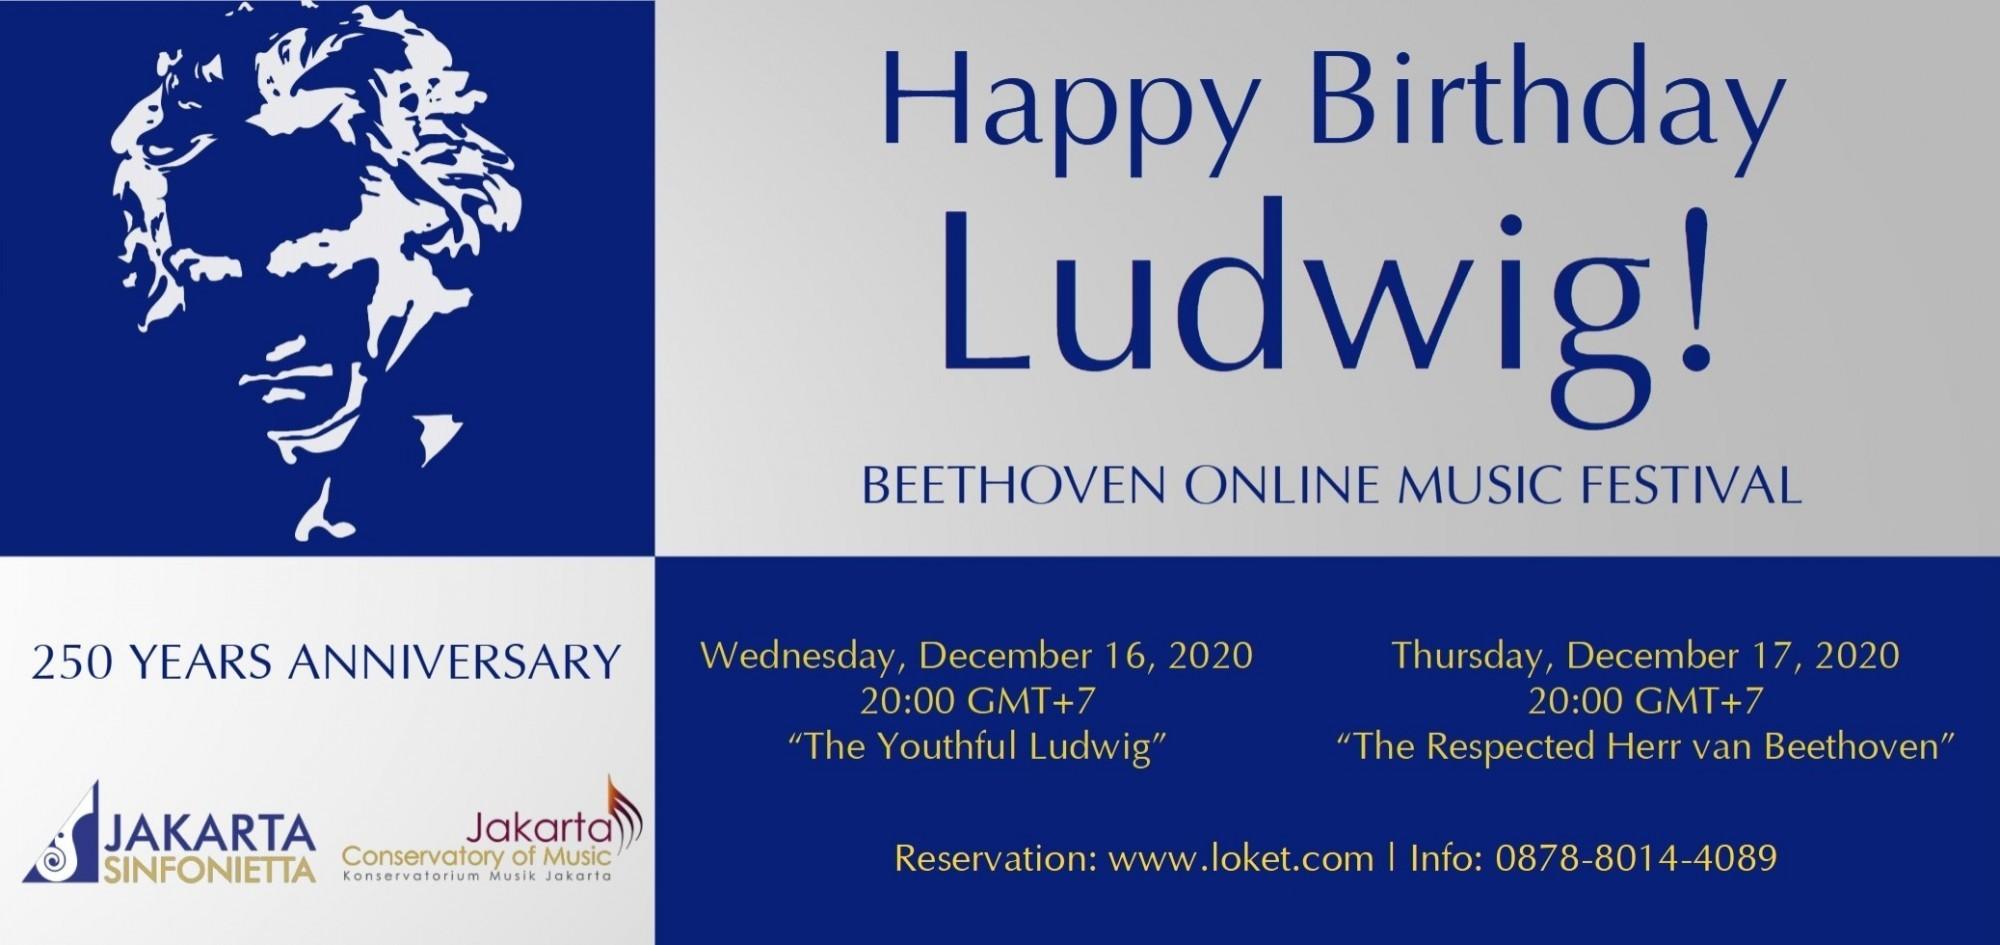 Happy Birthday Ludwig! 16-17 December 2020